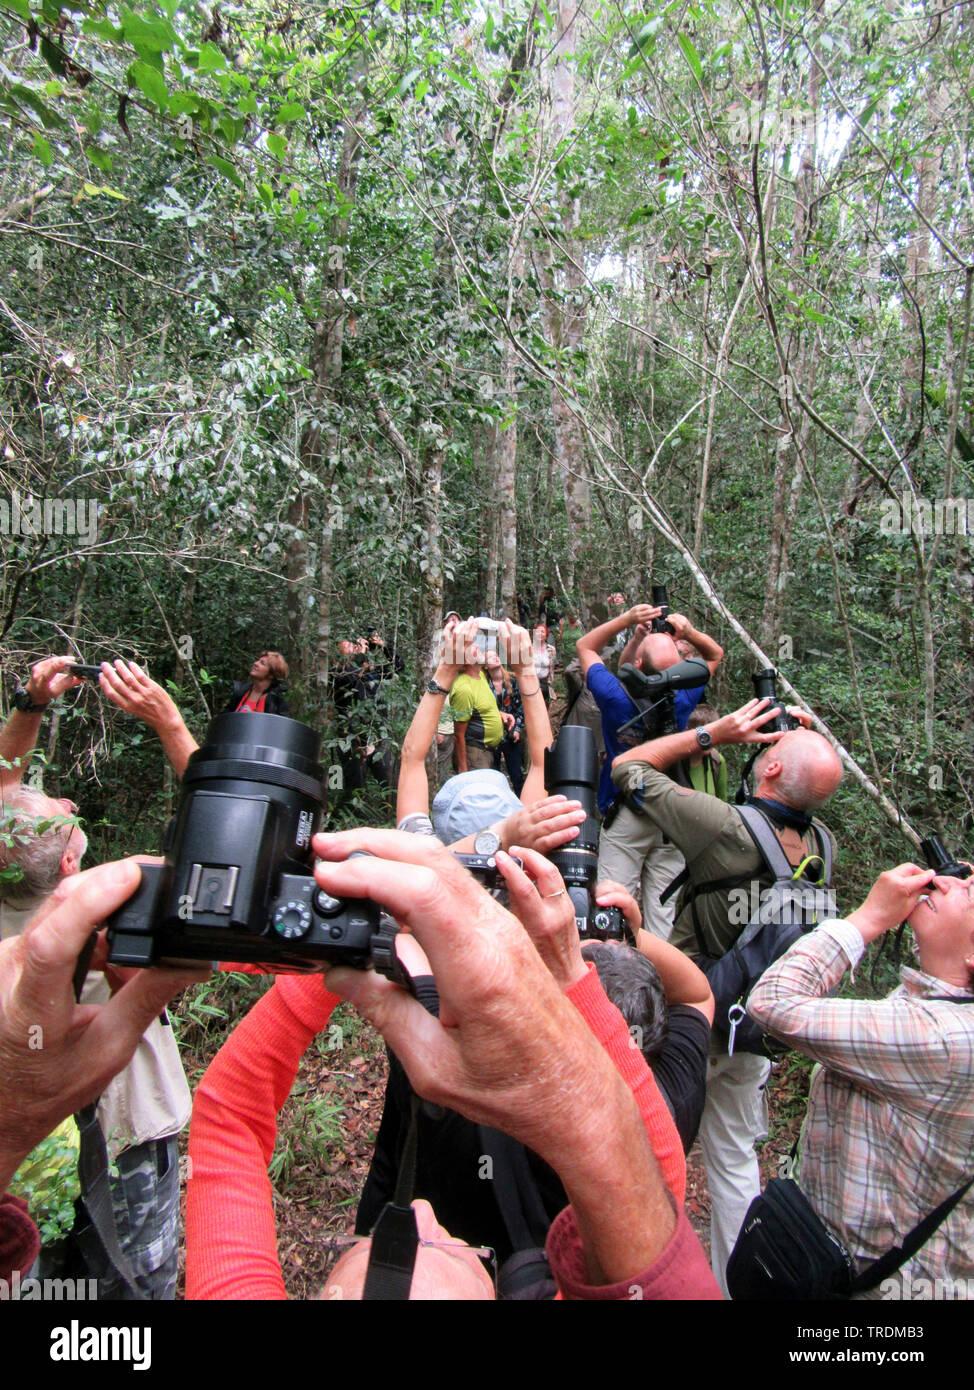 Sifakas (Propithecus spec.), Gruppe von Ornithologen auf Tour fotografieren Sifakas, Madagaskar | sifakas (Propithecus spec.), Birding tour groups pho - Stock Image